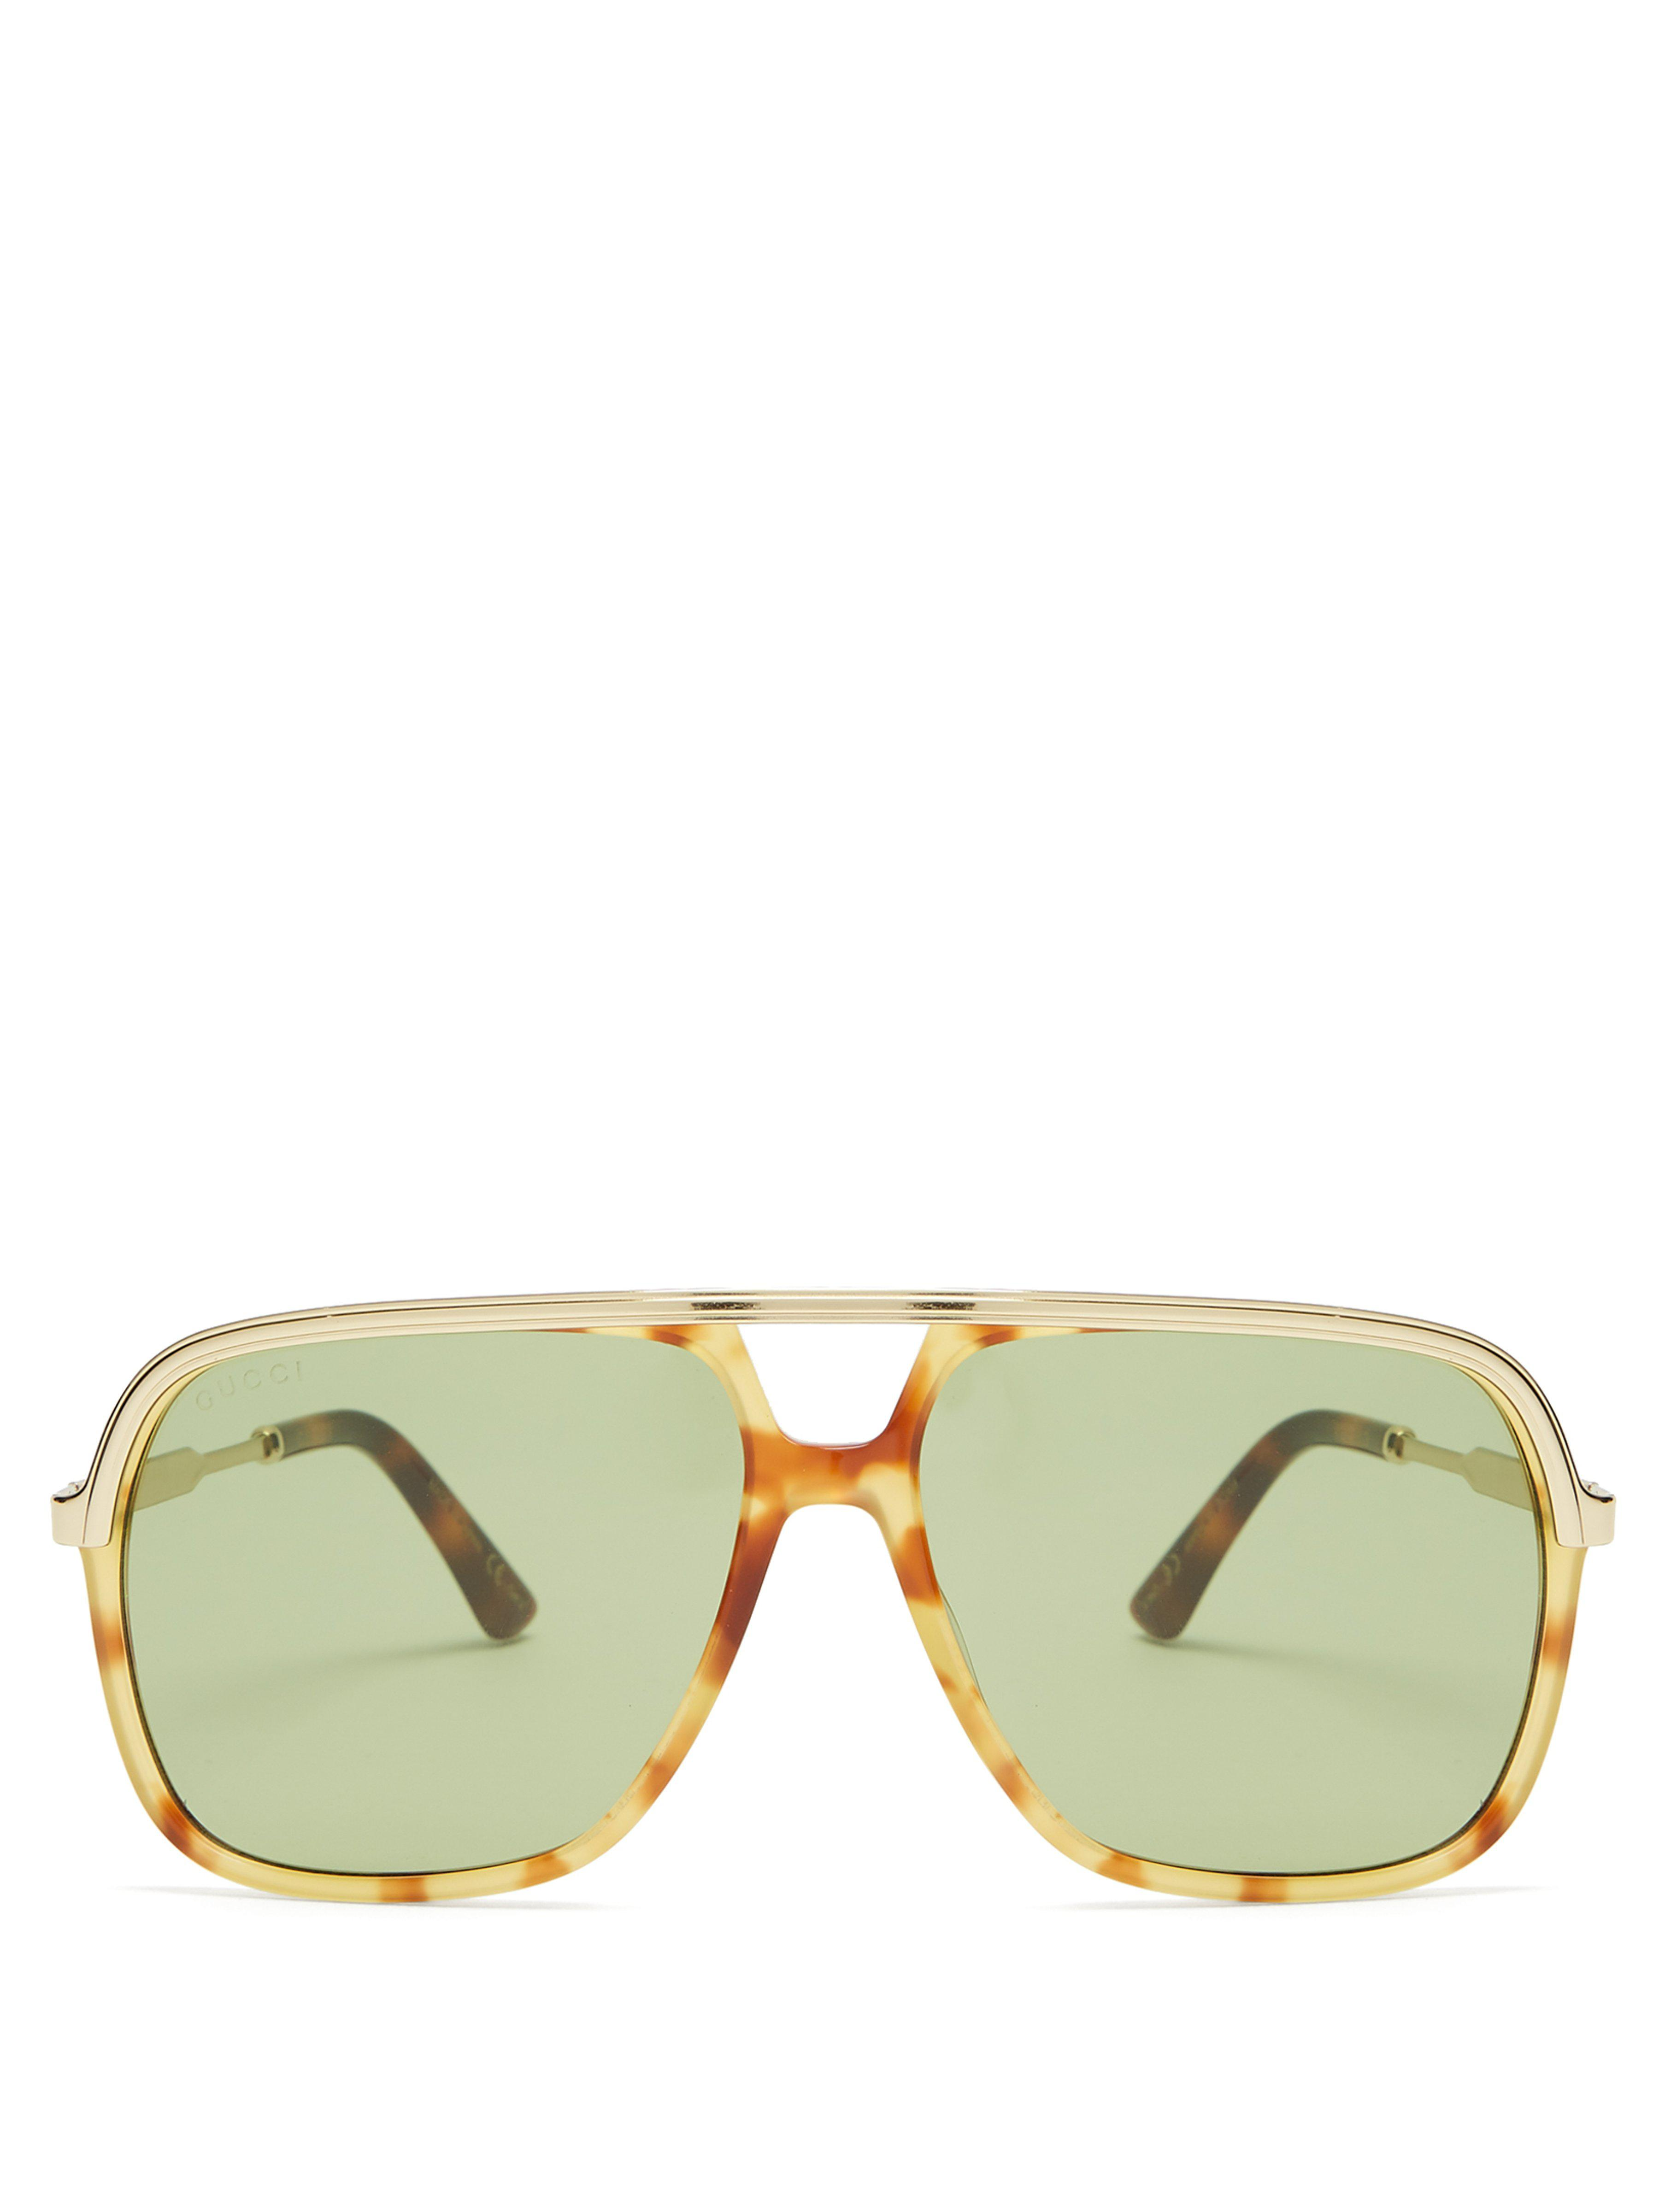 6de98479b41 Gucci Squared Aviator Acetate Sunglasses for Men - Lyst